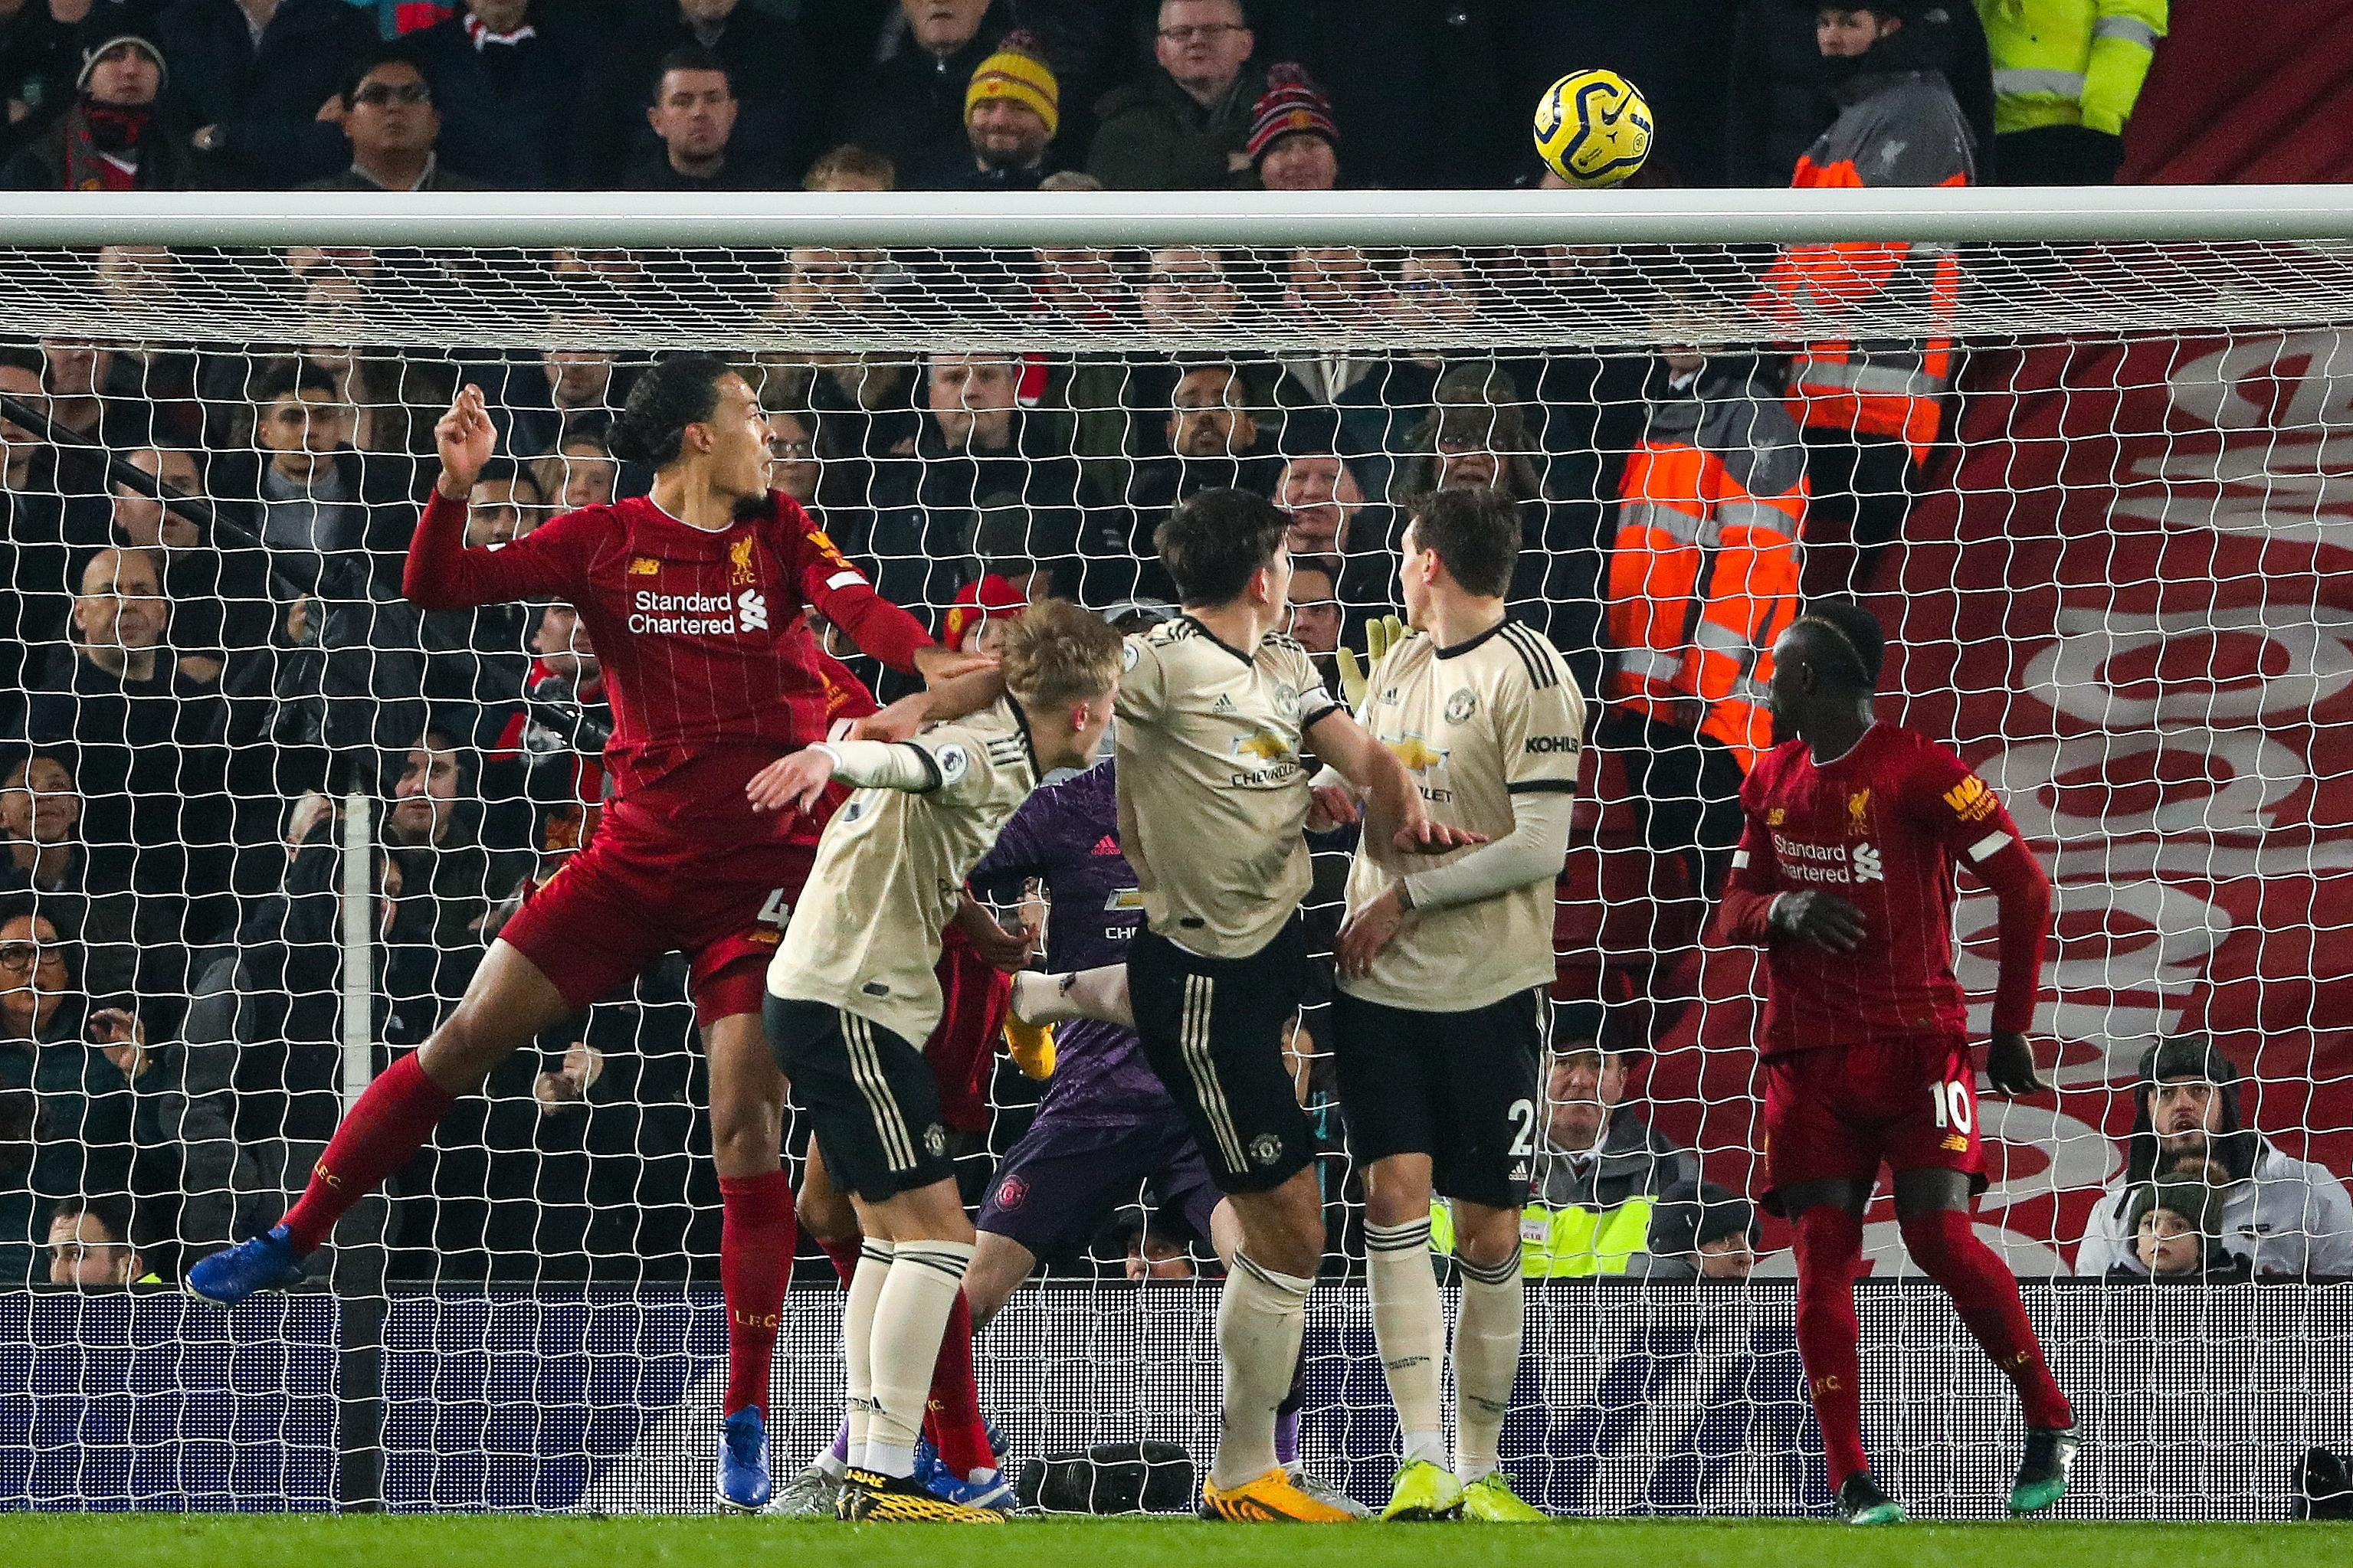 Манчестер юнайтед ливерпуль все матчи